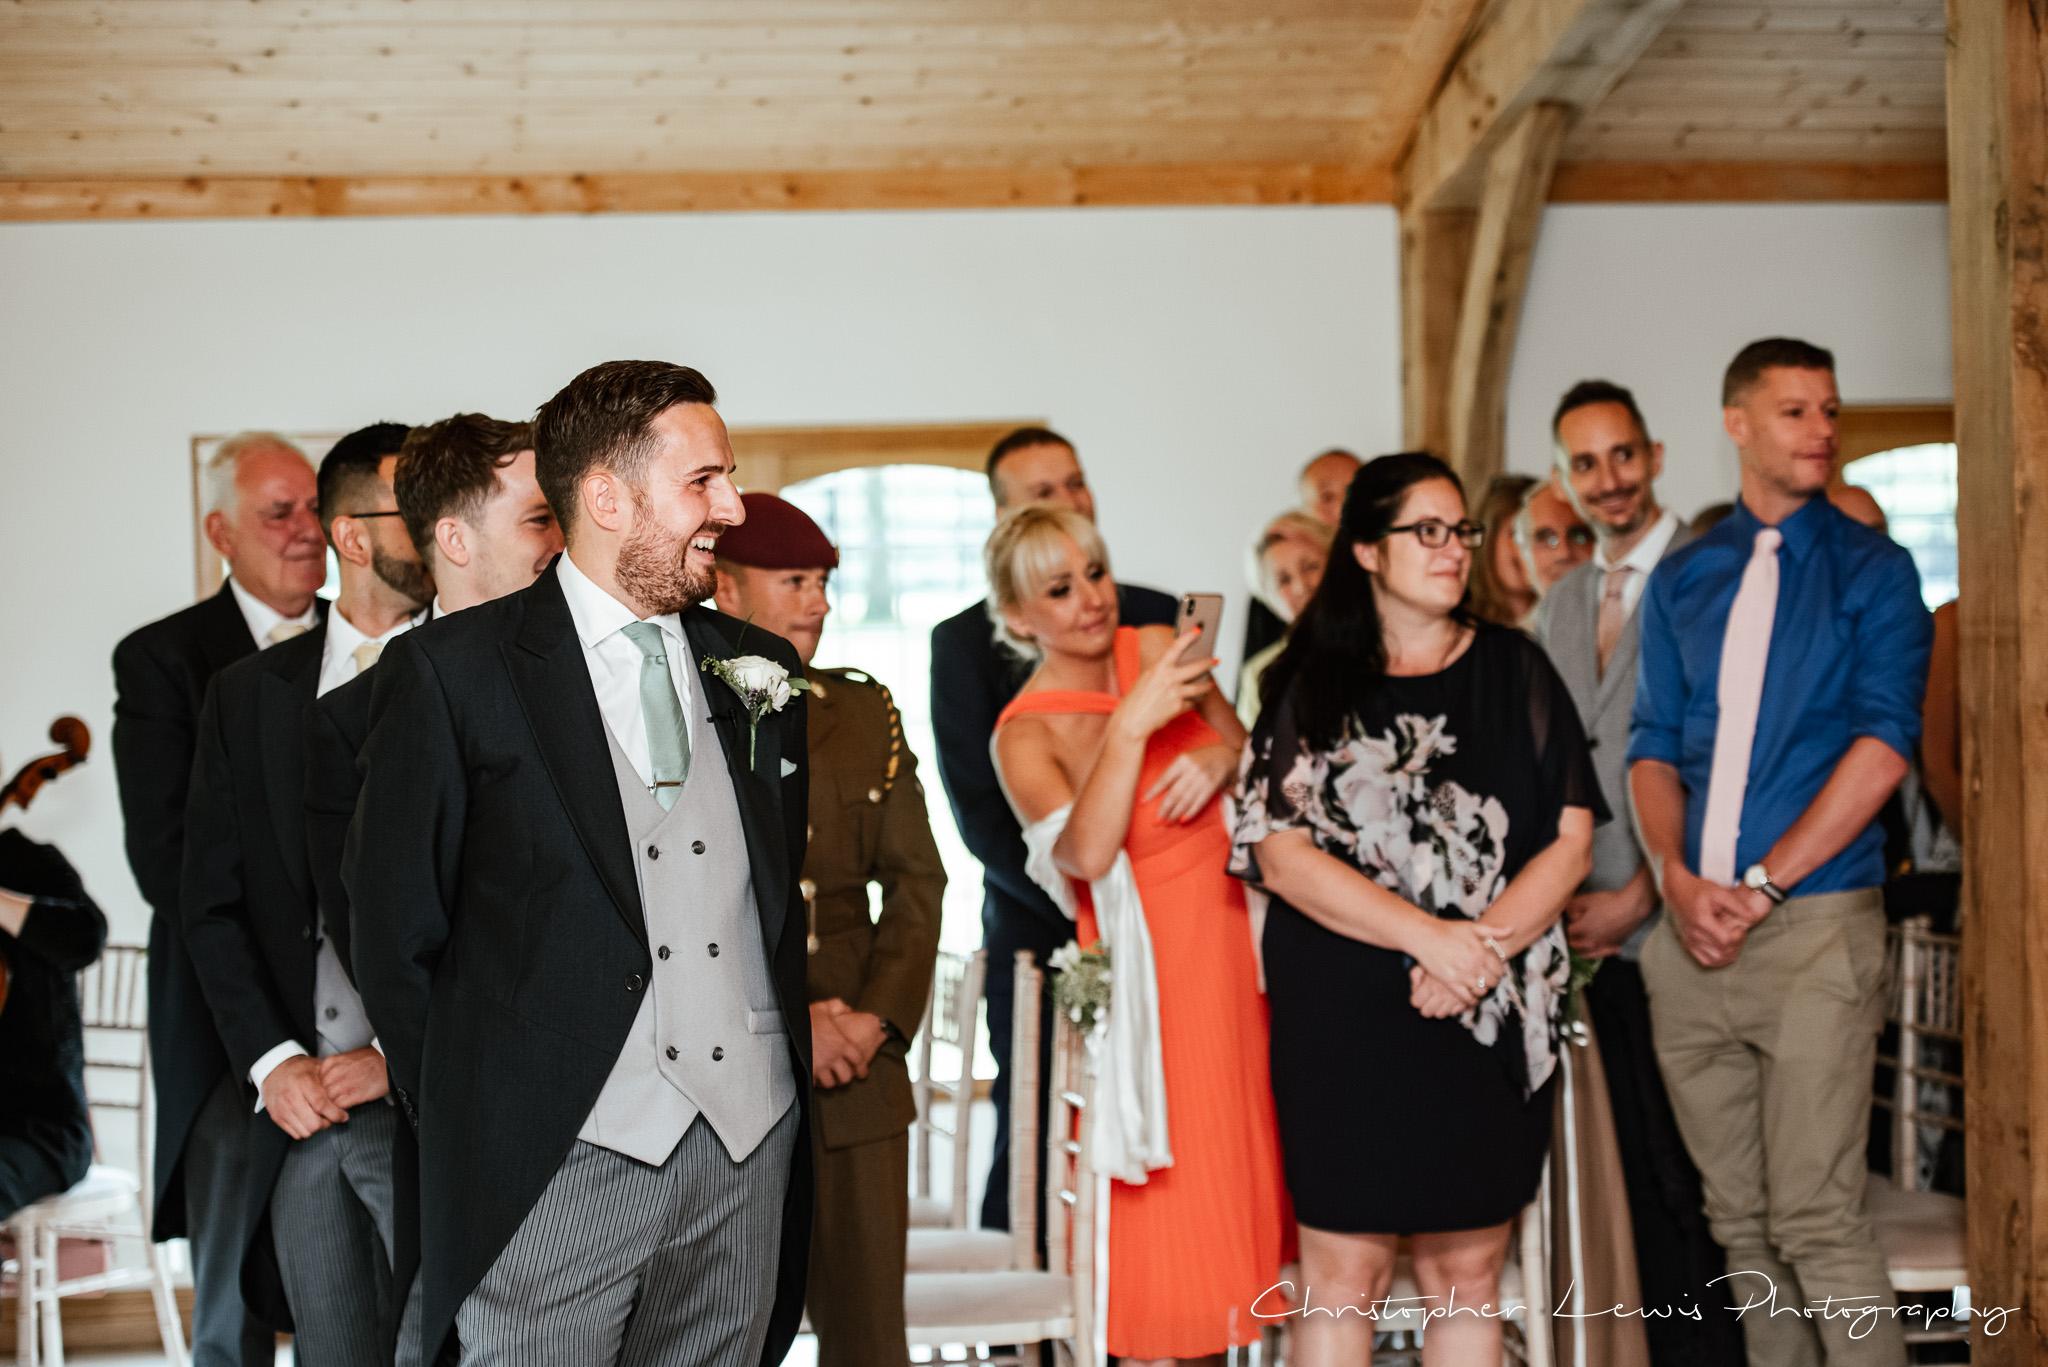 Colshaw Hall Wedding groom